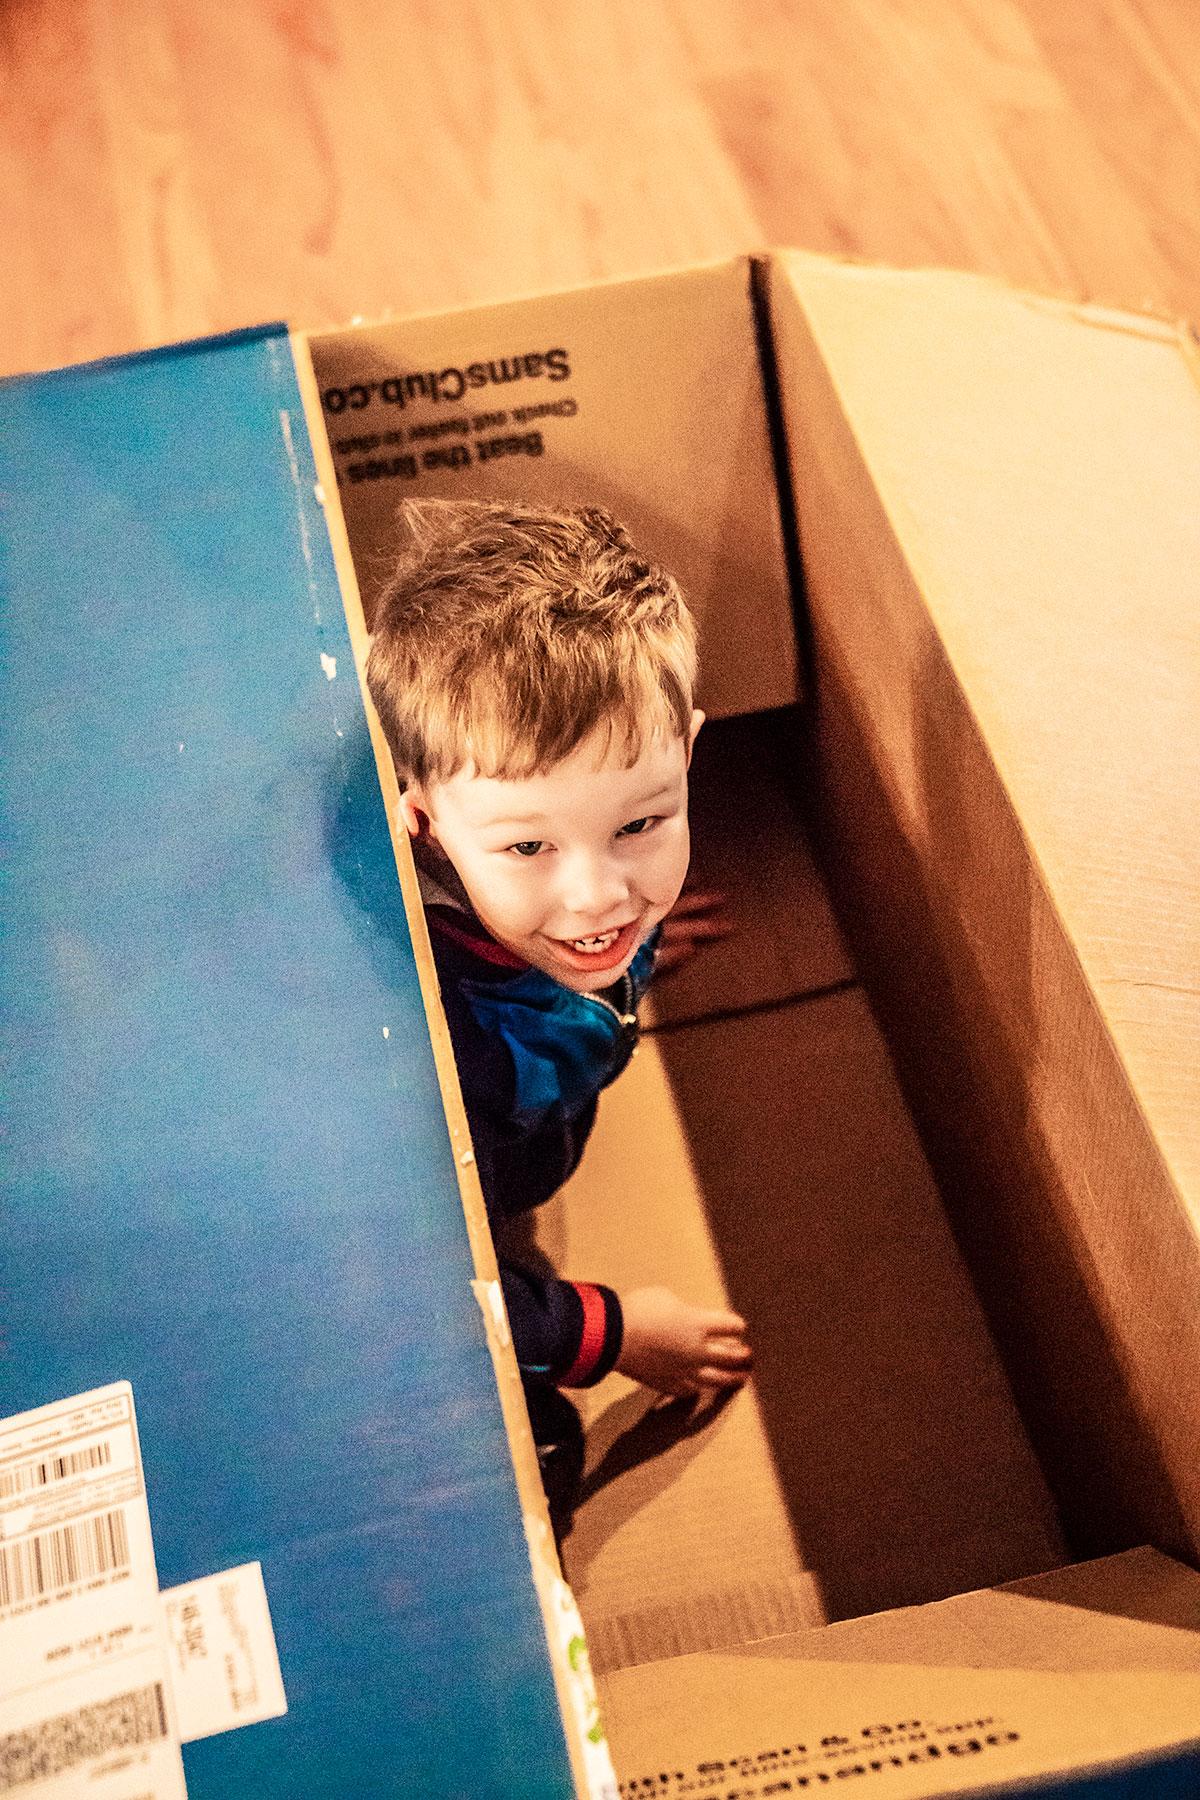 Trevor-in-a-box